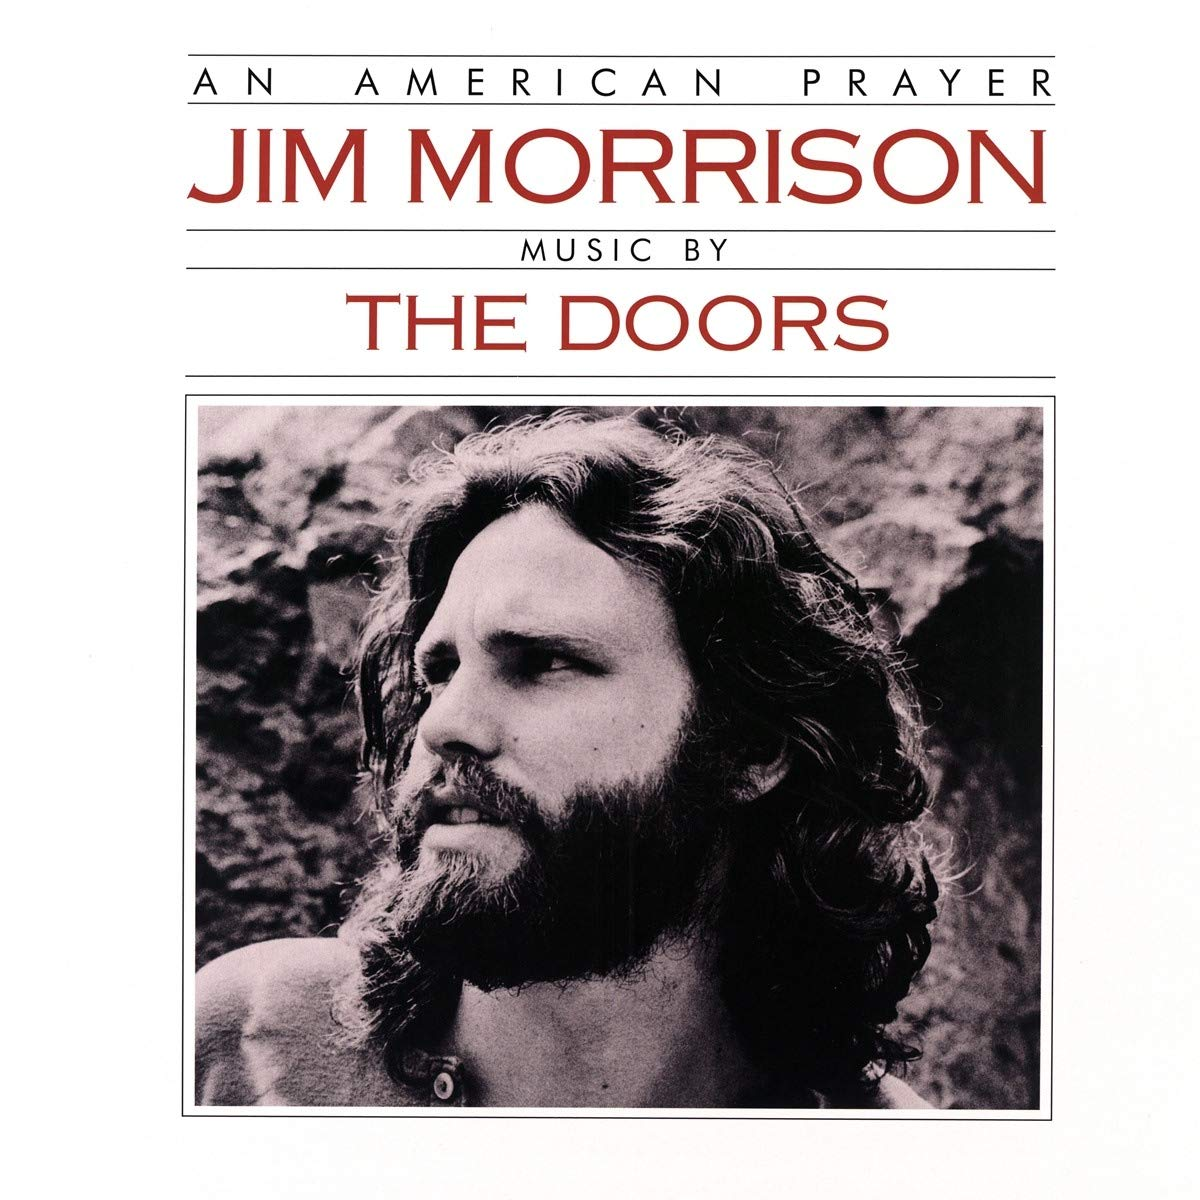 Jim Morrison & The Doors - An American Prayer [LP]